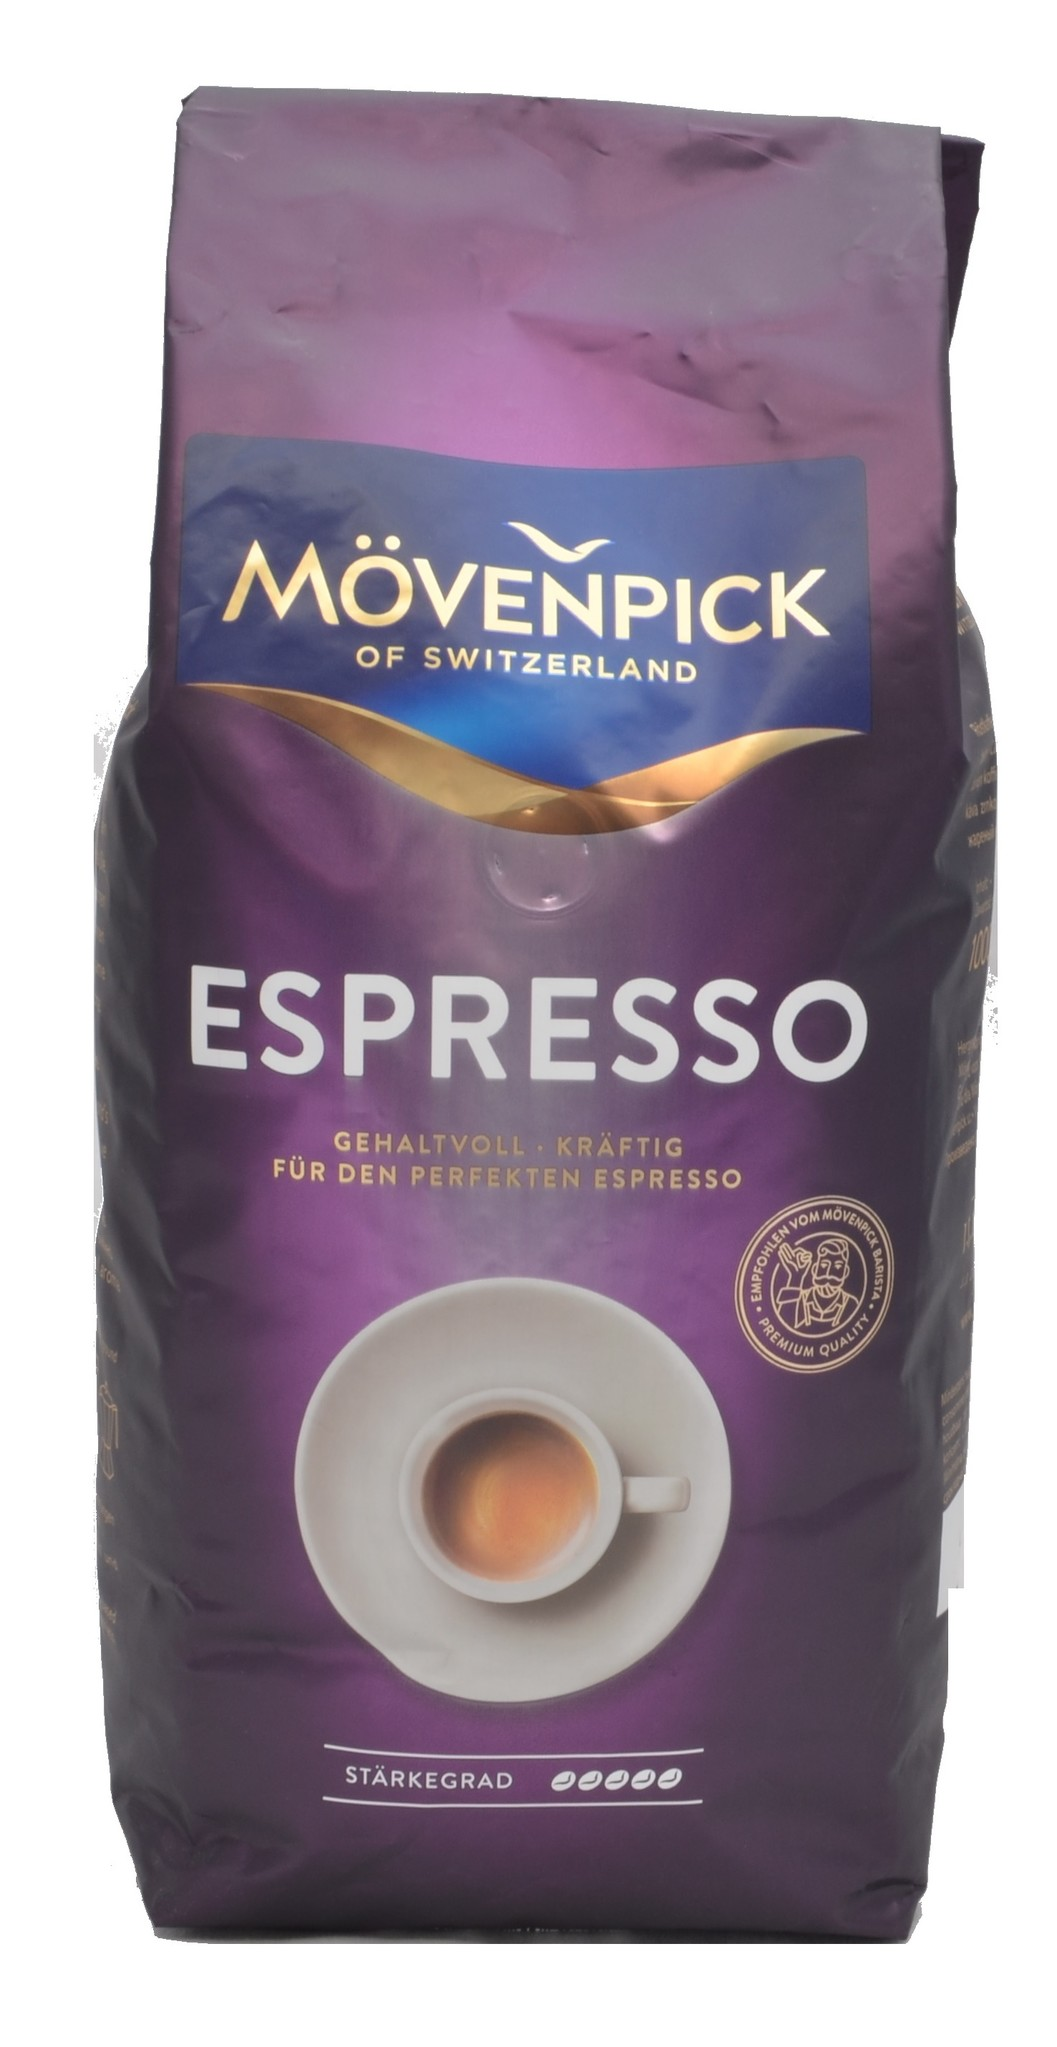 Mövenpick Espresso bonen 1 kg. nu vanaf € 7.85